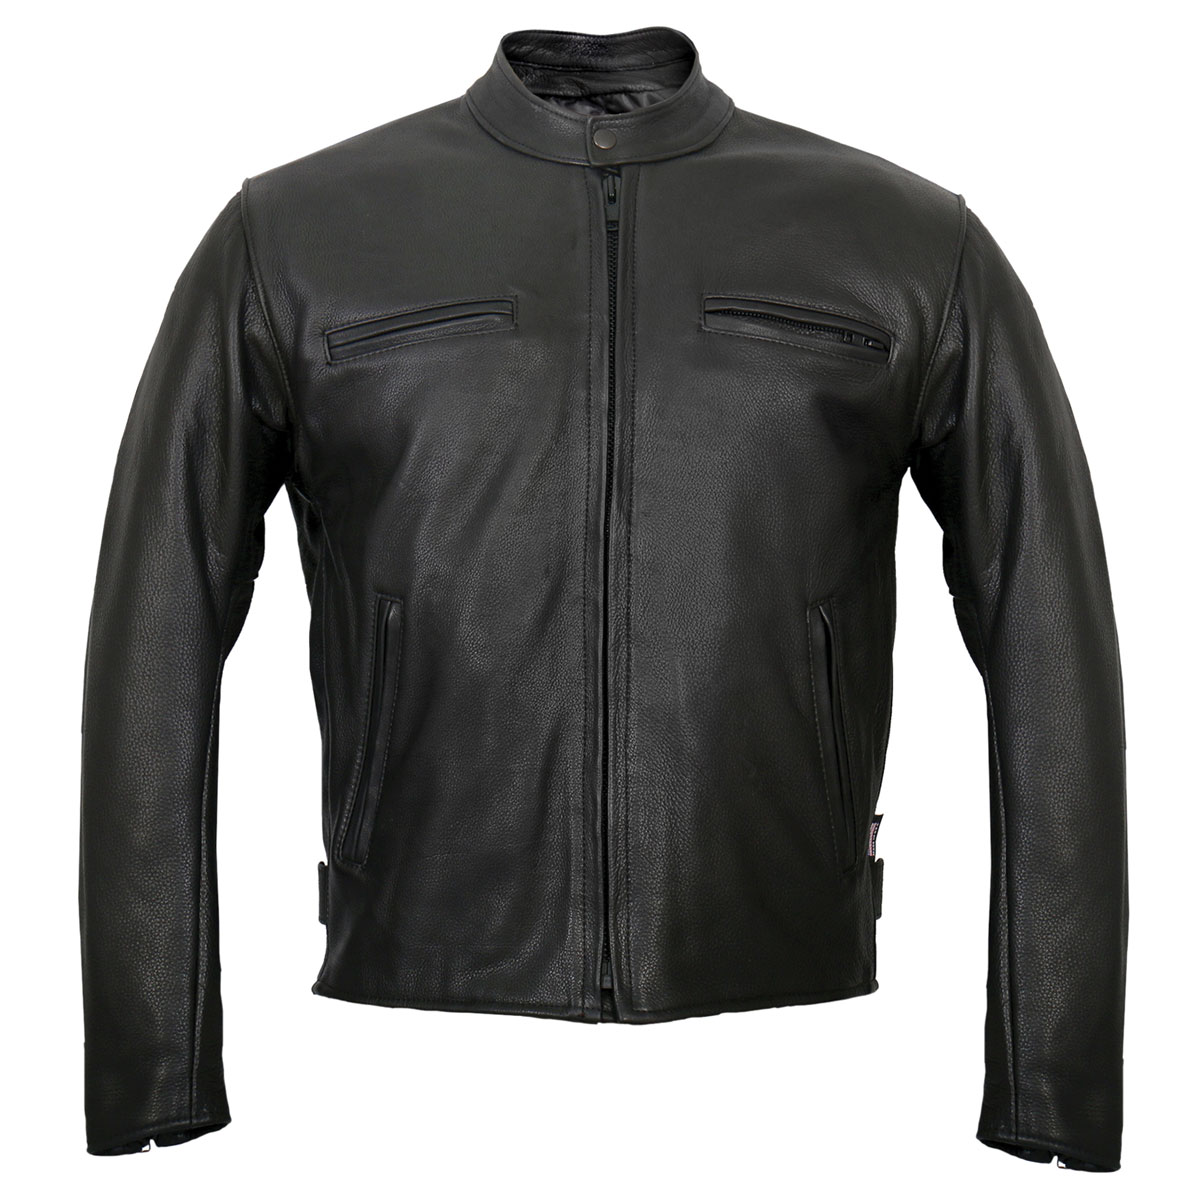 Hot Leathers Men's USA Made Racer Black Leather Jacket